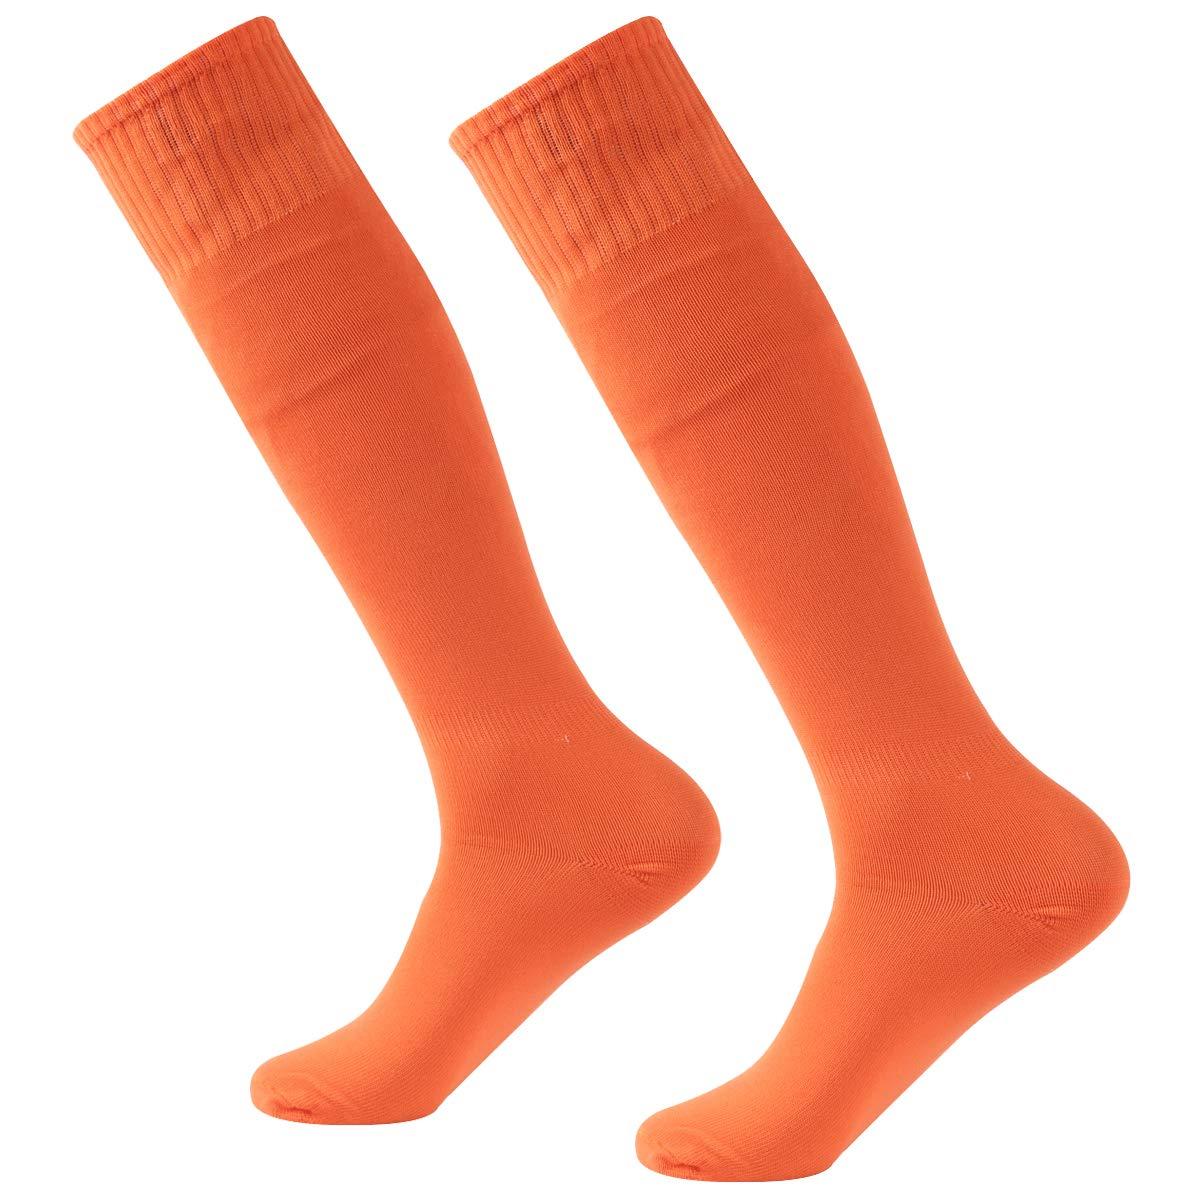 Baseball Socks,Fasoar Mens Womens Youth Over the Calf Rugby Cycling Soccer Socks 2 Pairs Orange by Fasoar